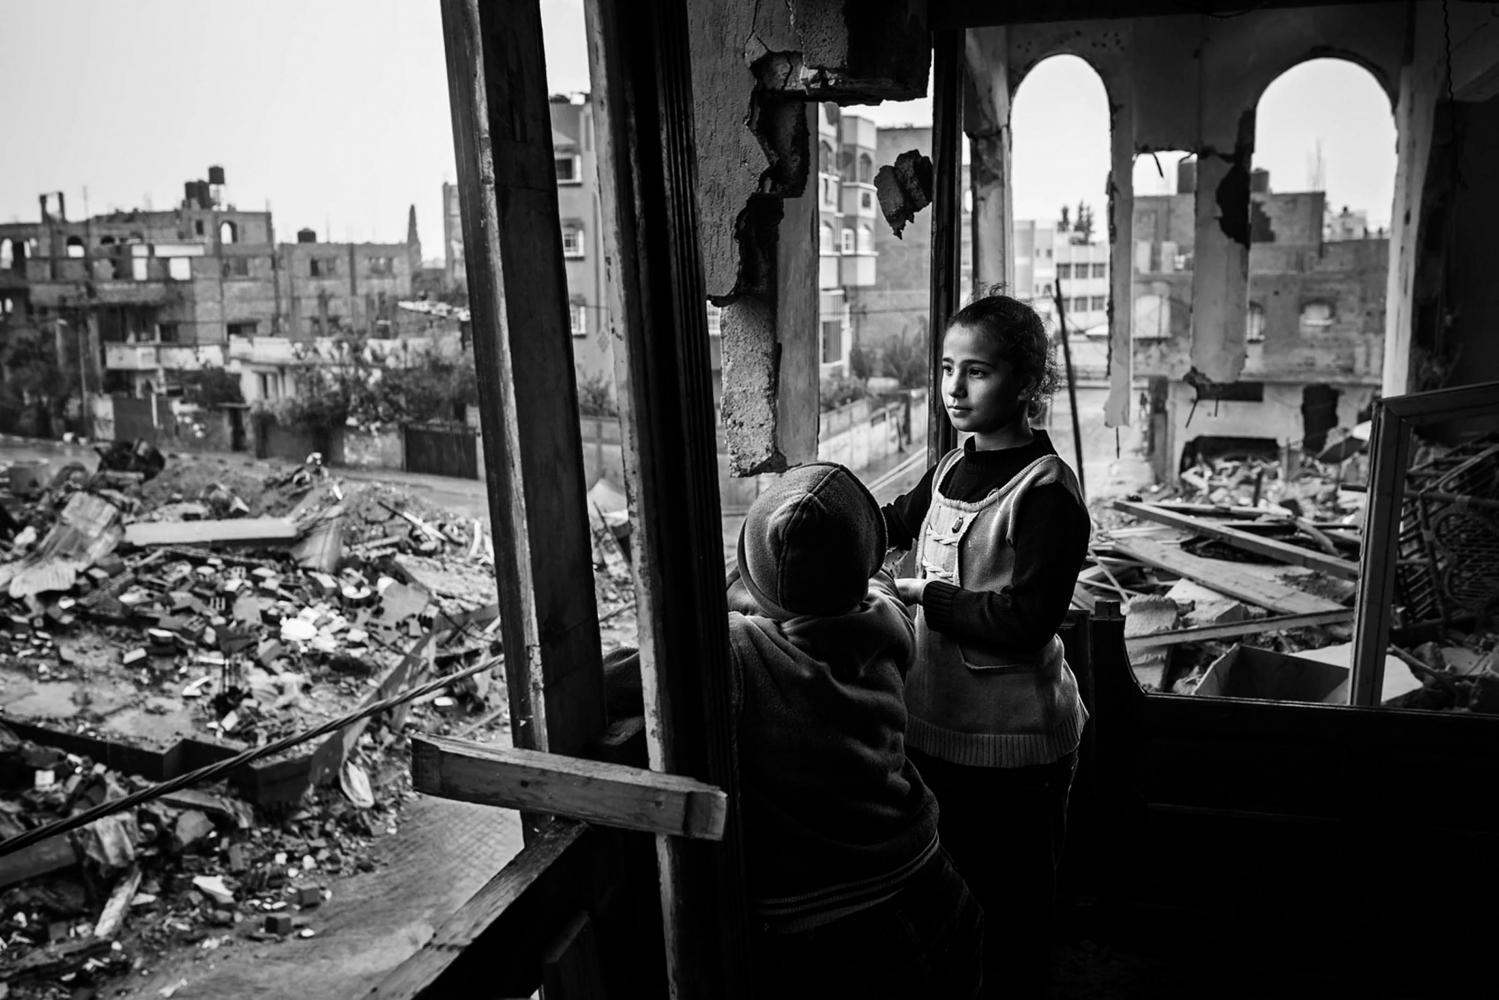 Gaza, Beit Hanoun: Shorouk Abu Ouda, 11 ans, regarde la pluie qui tombe sur les ruines de son quartier. 16/11/14